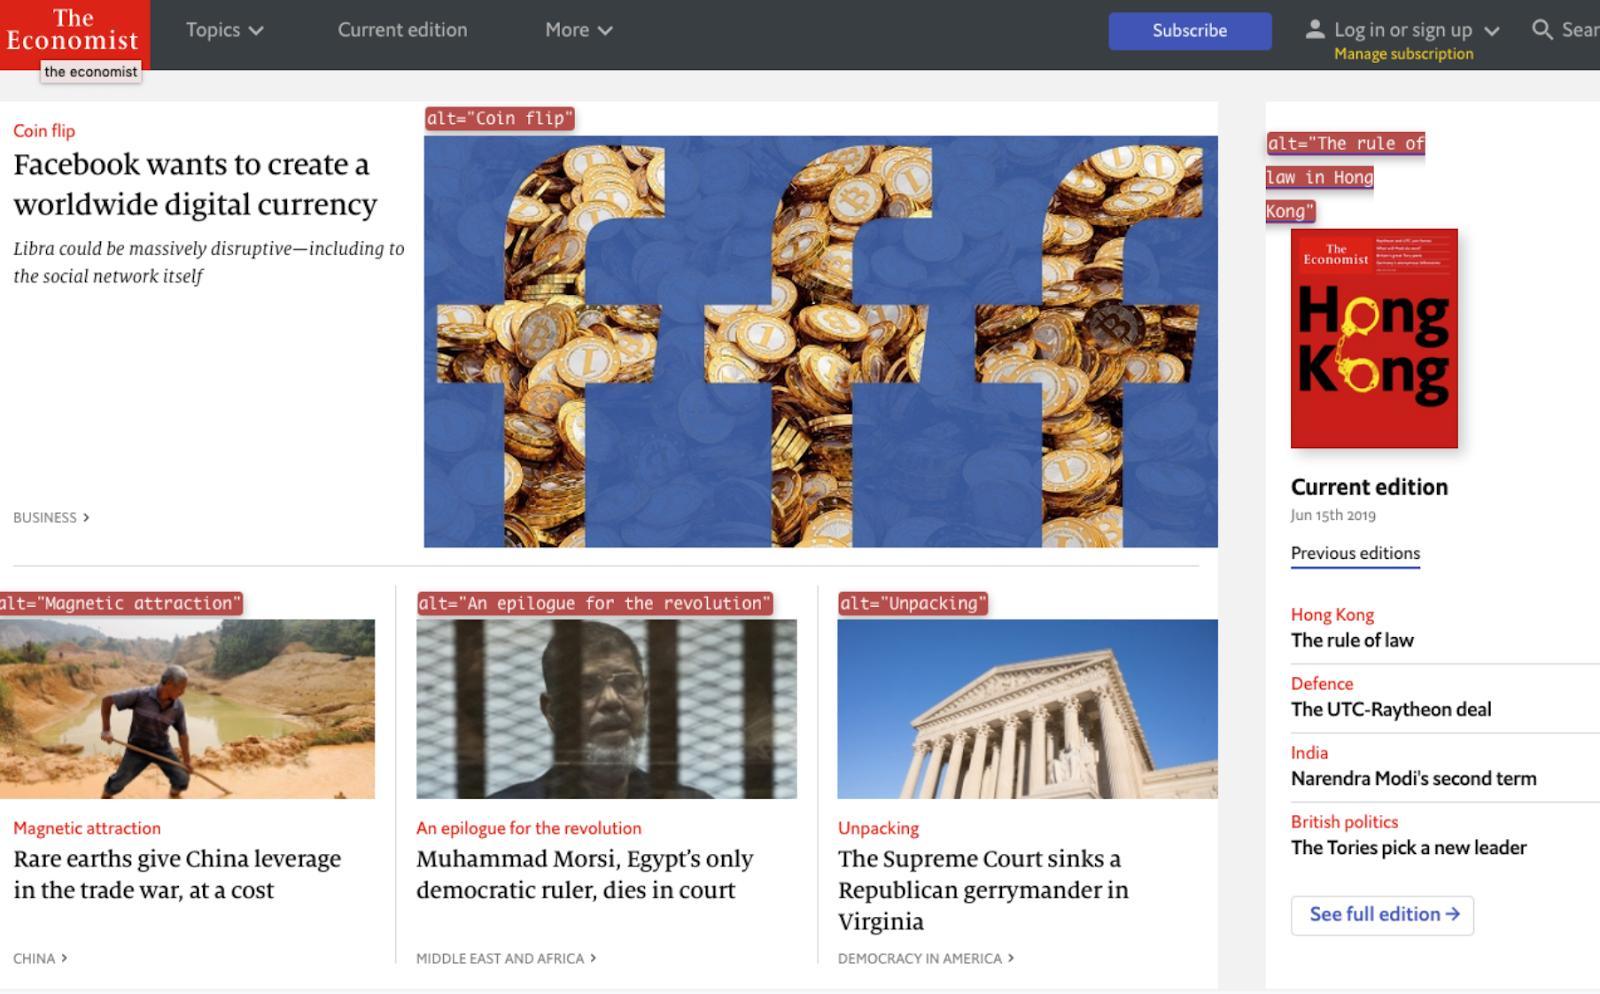 Slide shows the alt text on images on the Economist website